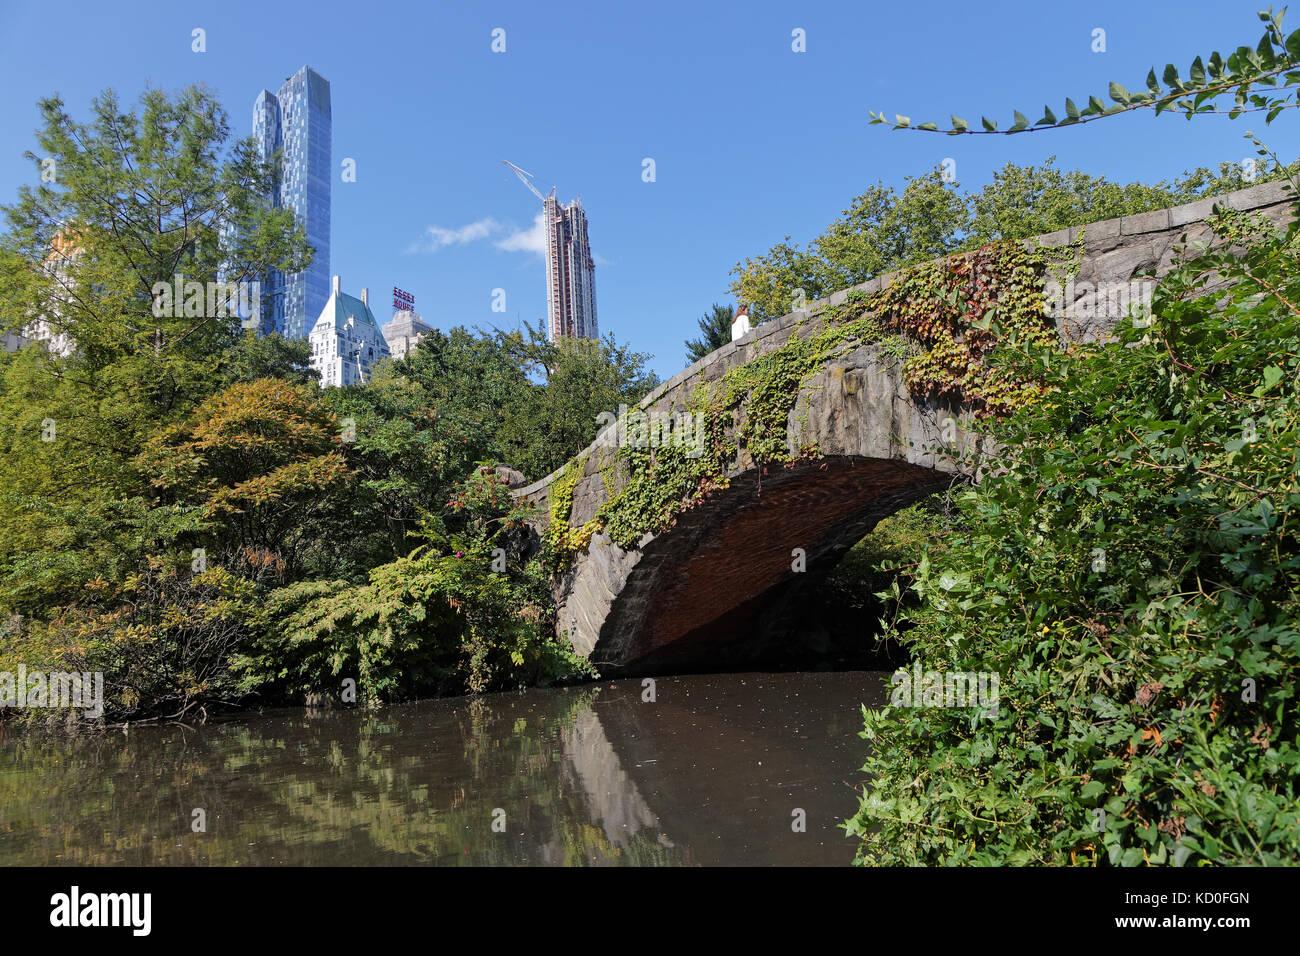 NEW YORK CITY, USA, September 10, 2017 : Gapstow Bridge in Central Park. The simple fieldstone arch of Gapstow Bridge - Stock Image